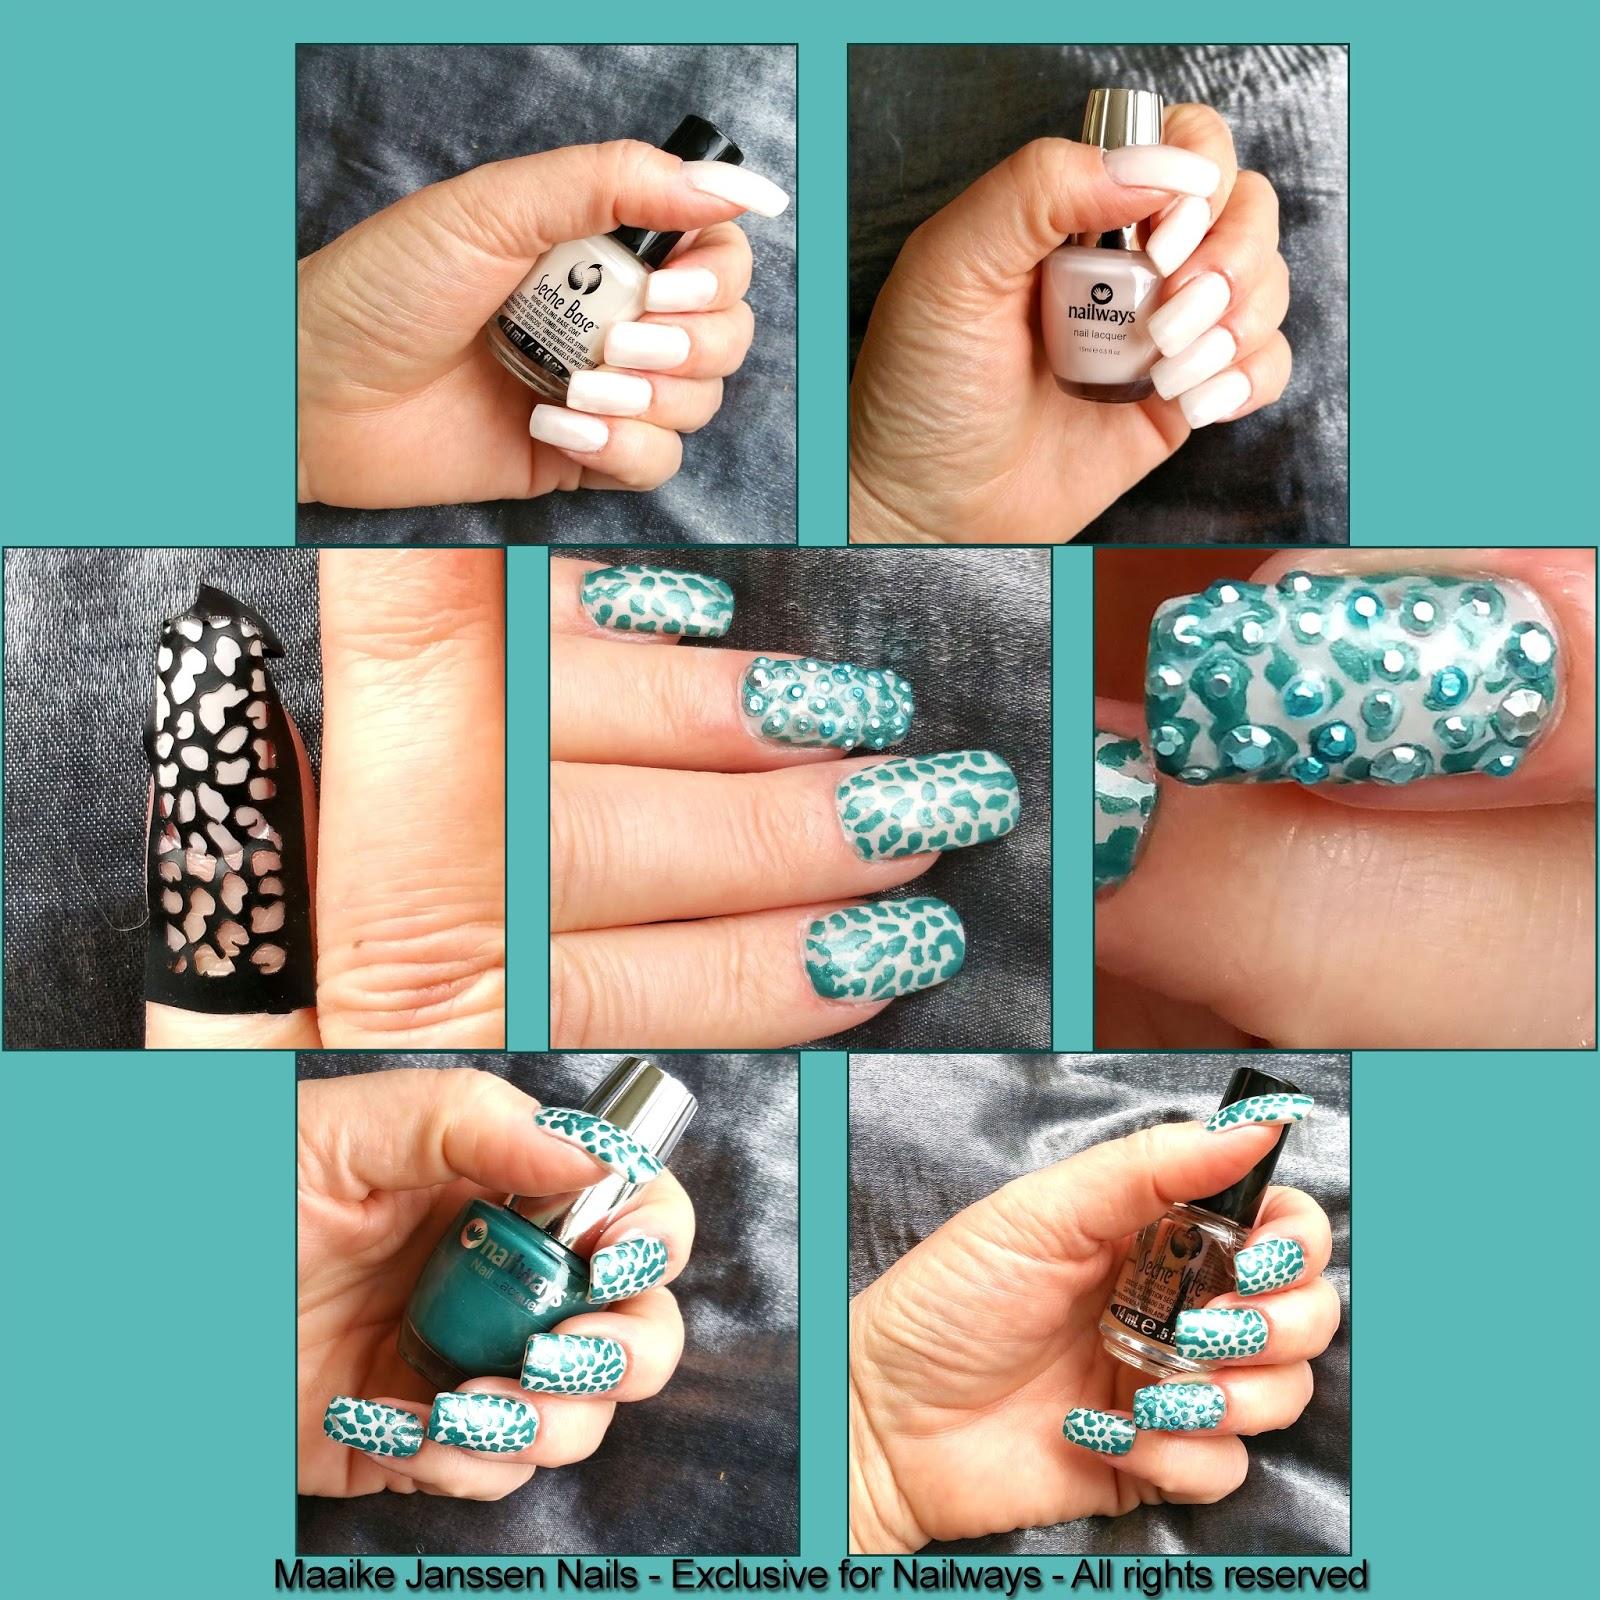 Nailways Green Spot Nail Art